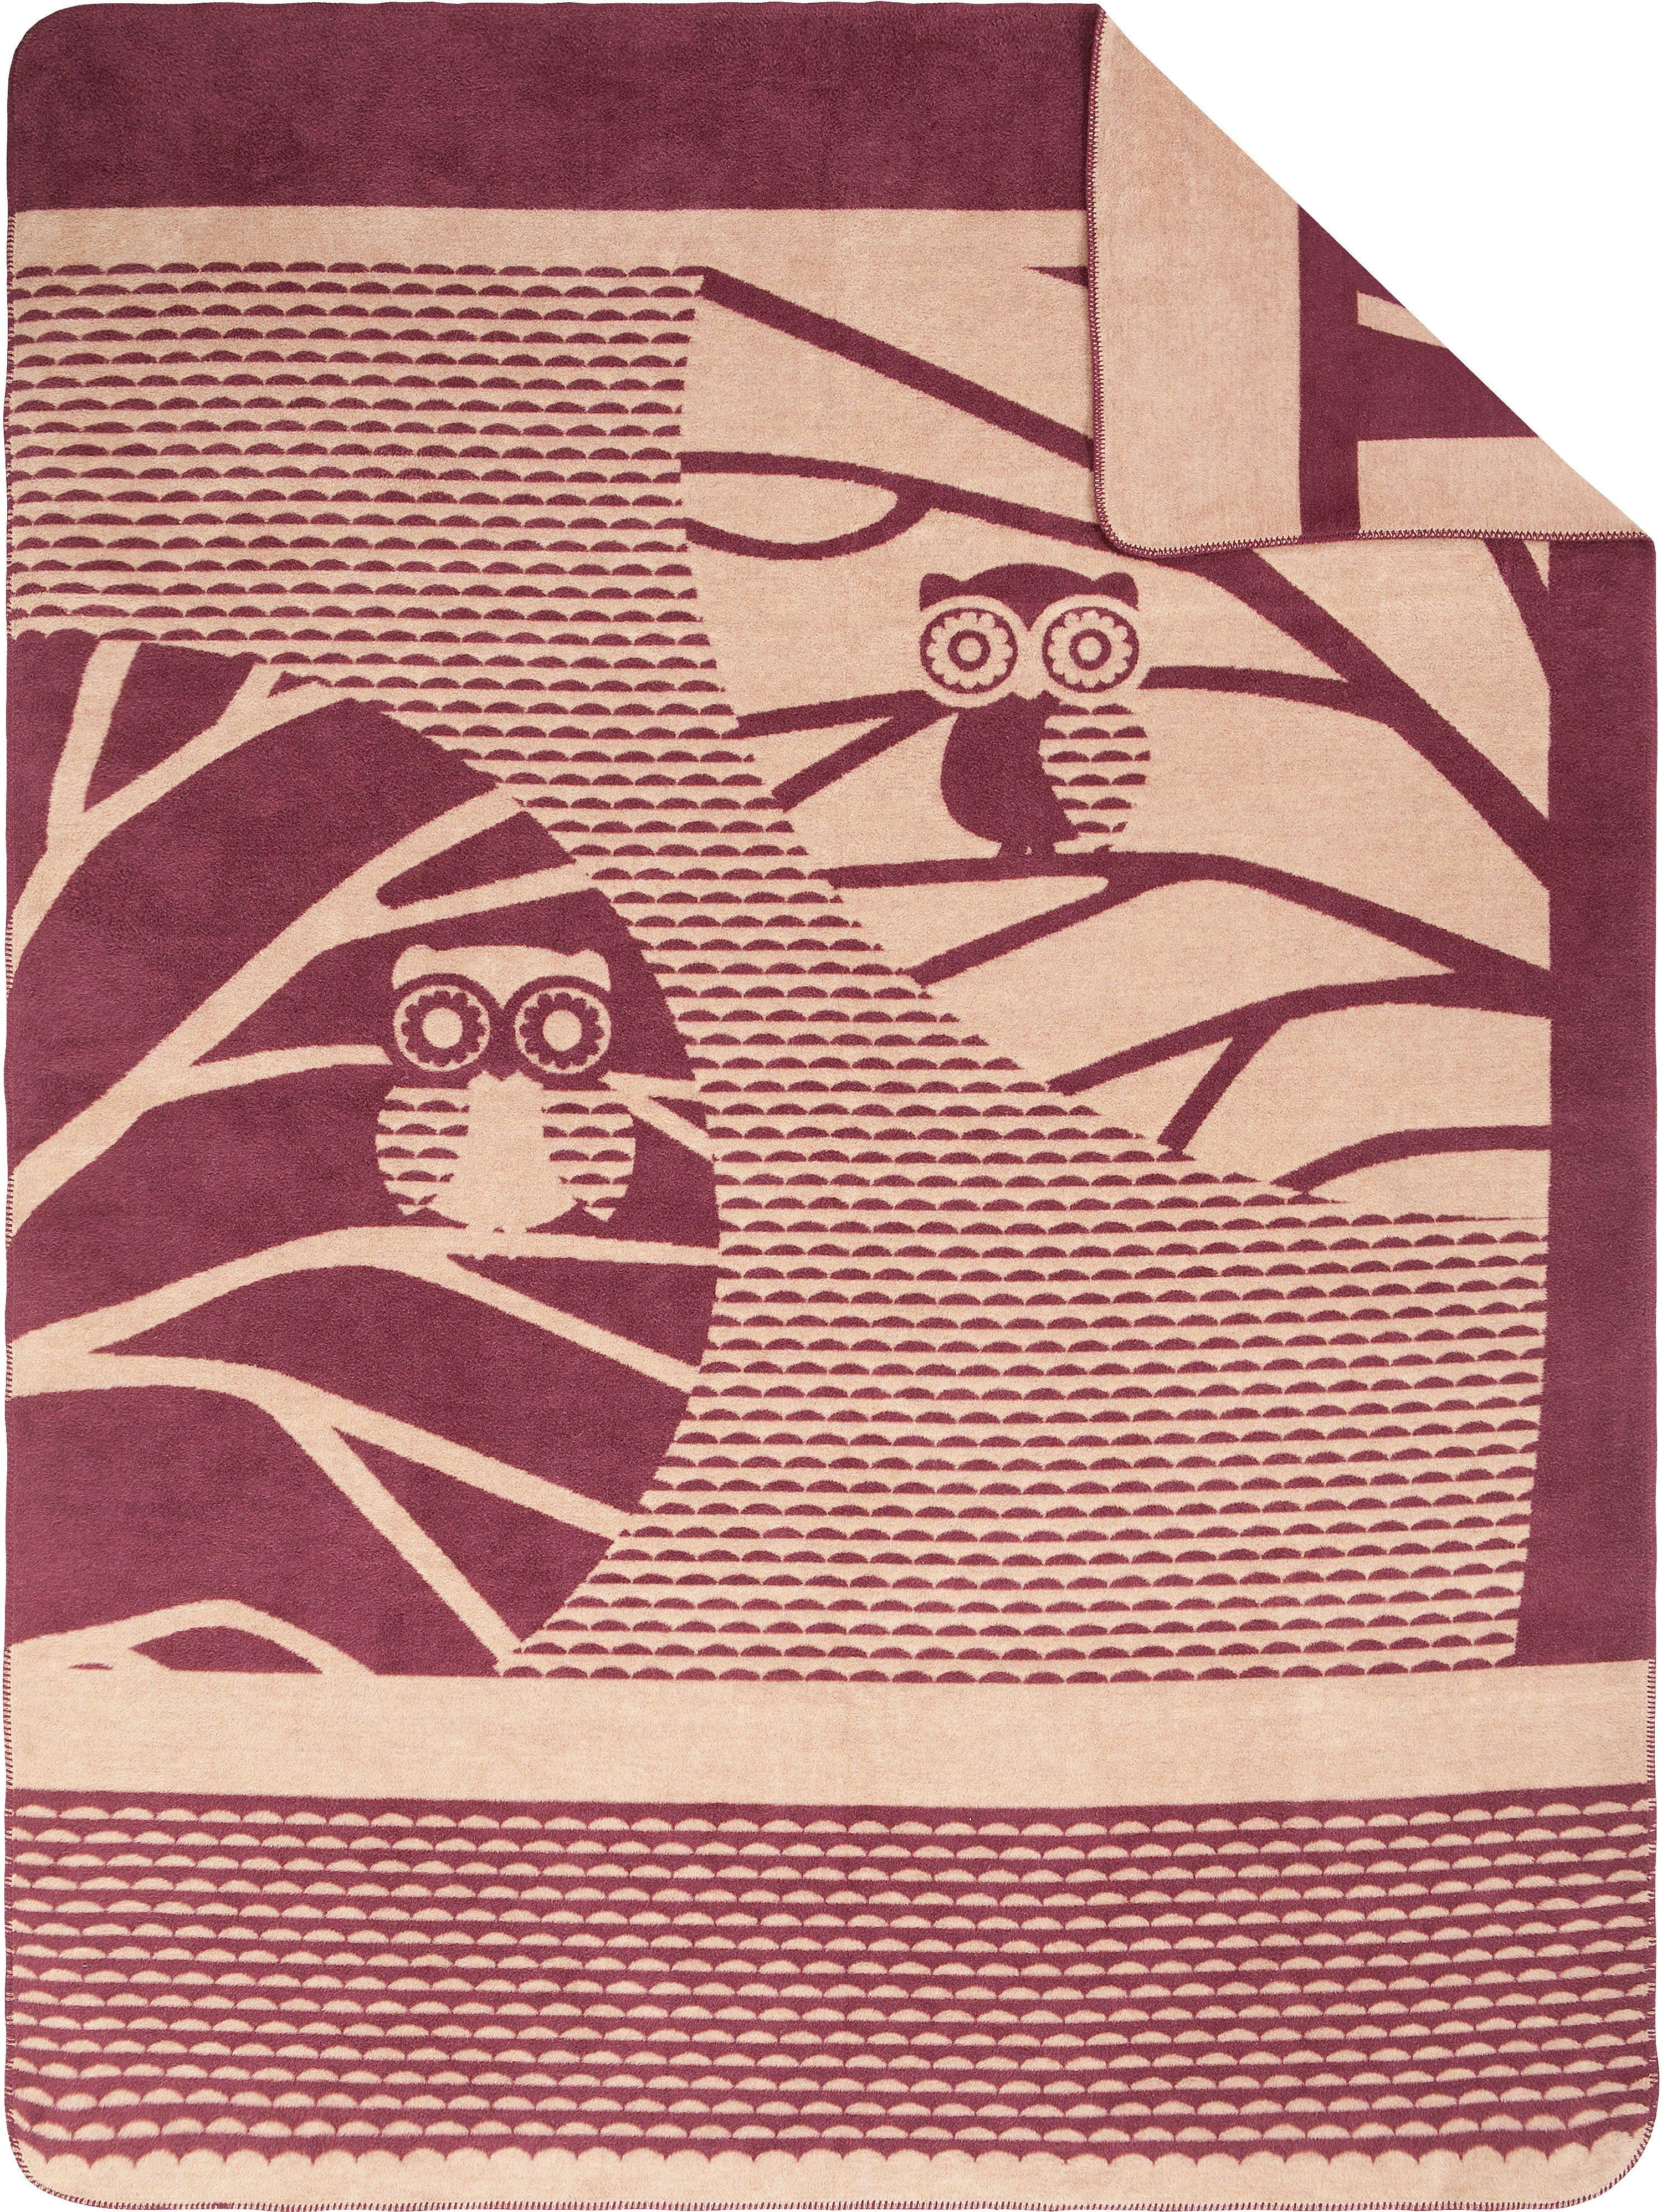 Wohndecke, Ibena, »Owl«, mit Eulenmotiv